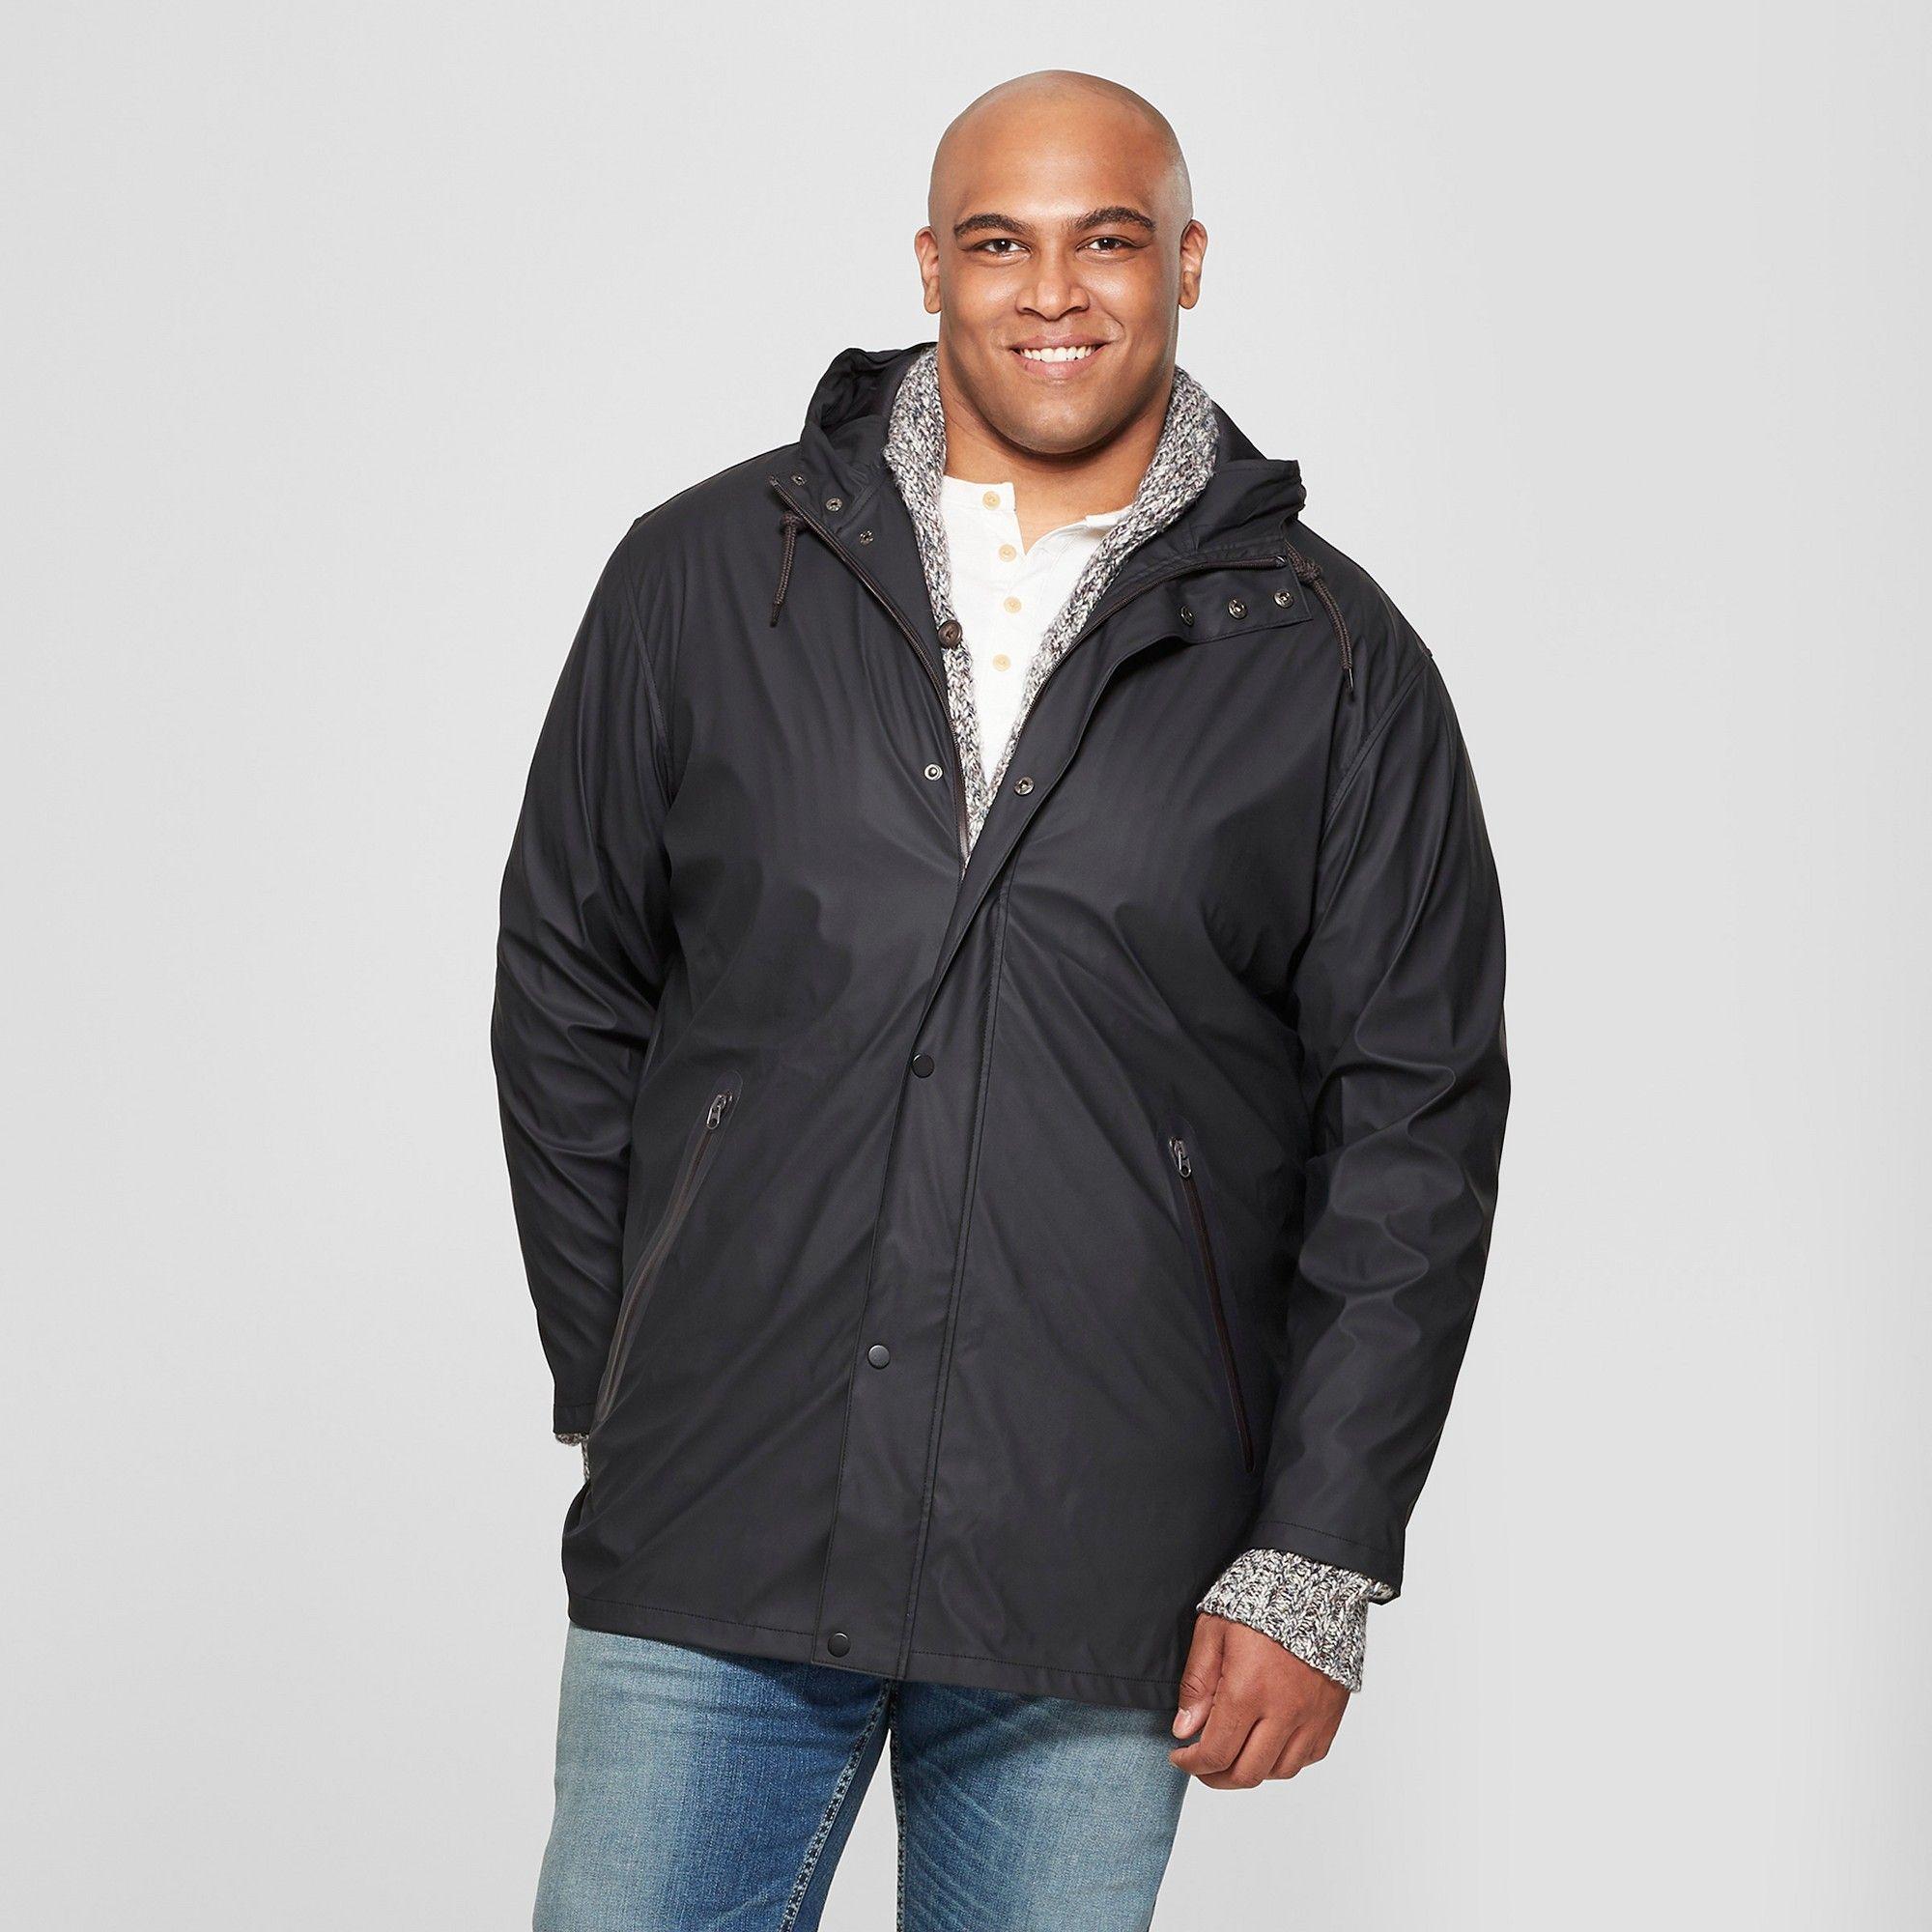 1caf15d00 Men's Big & Tall Rubber Rain Jacket - Goodfellow & Co Black 3XBT ...